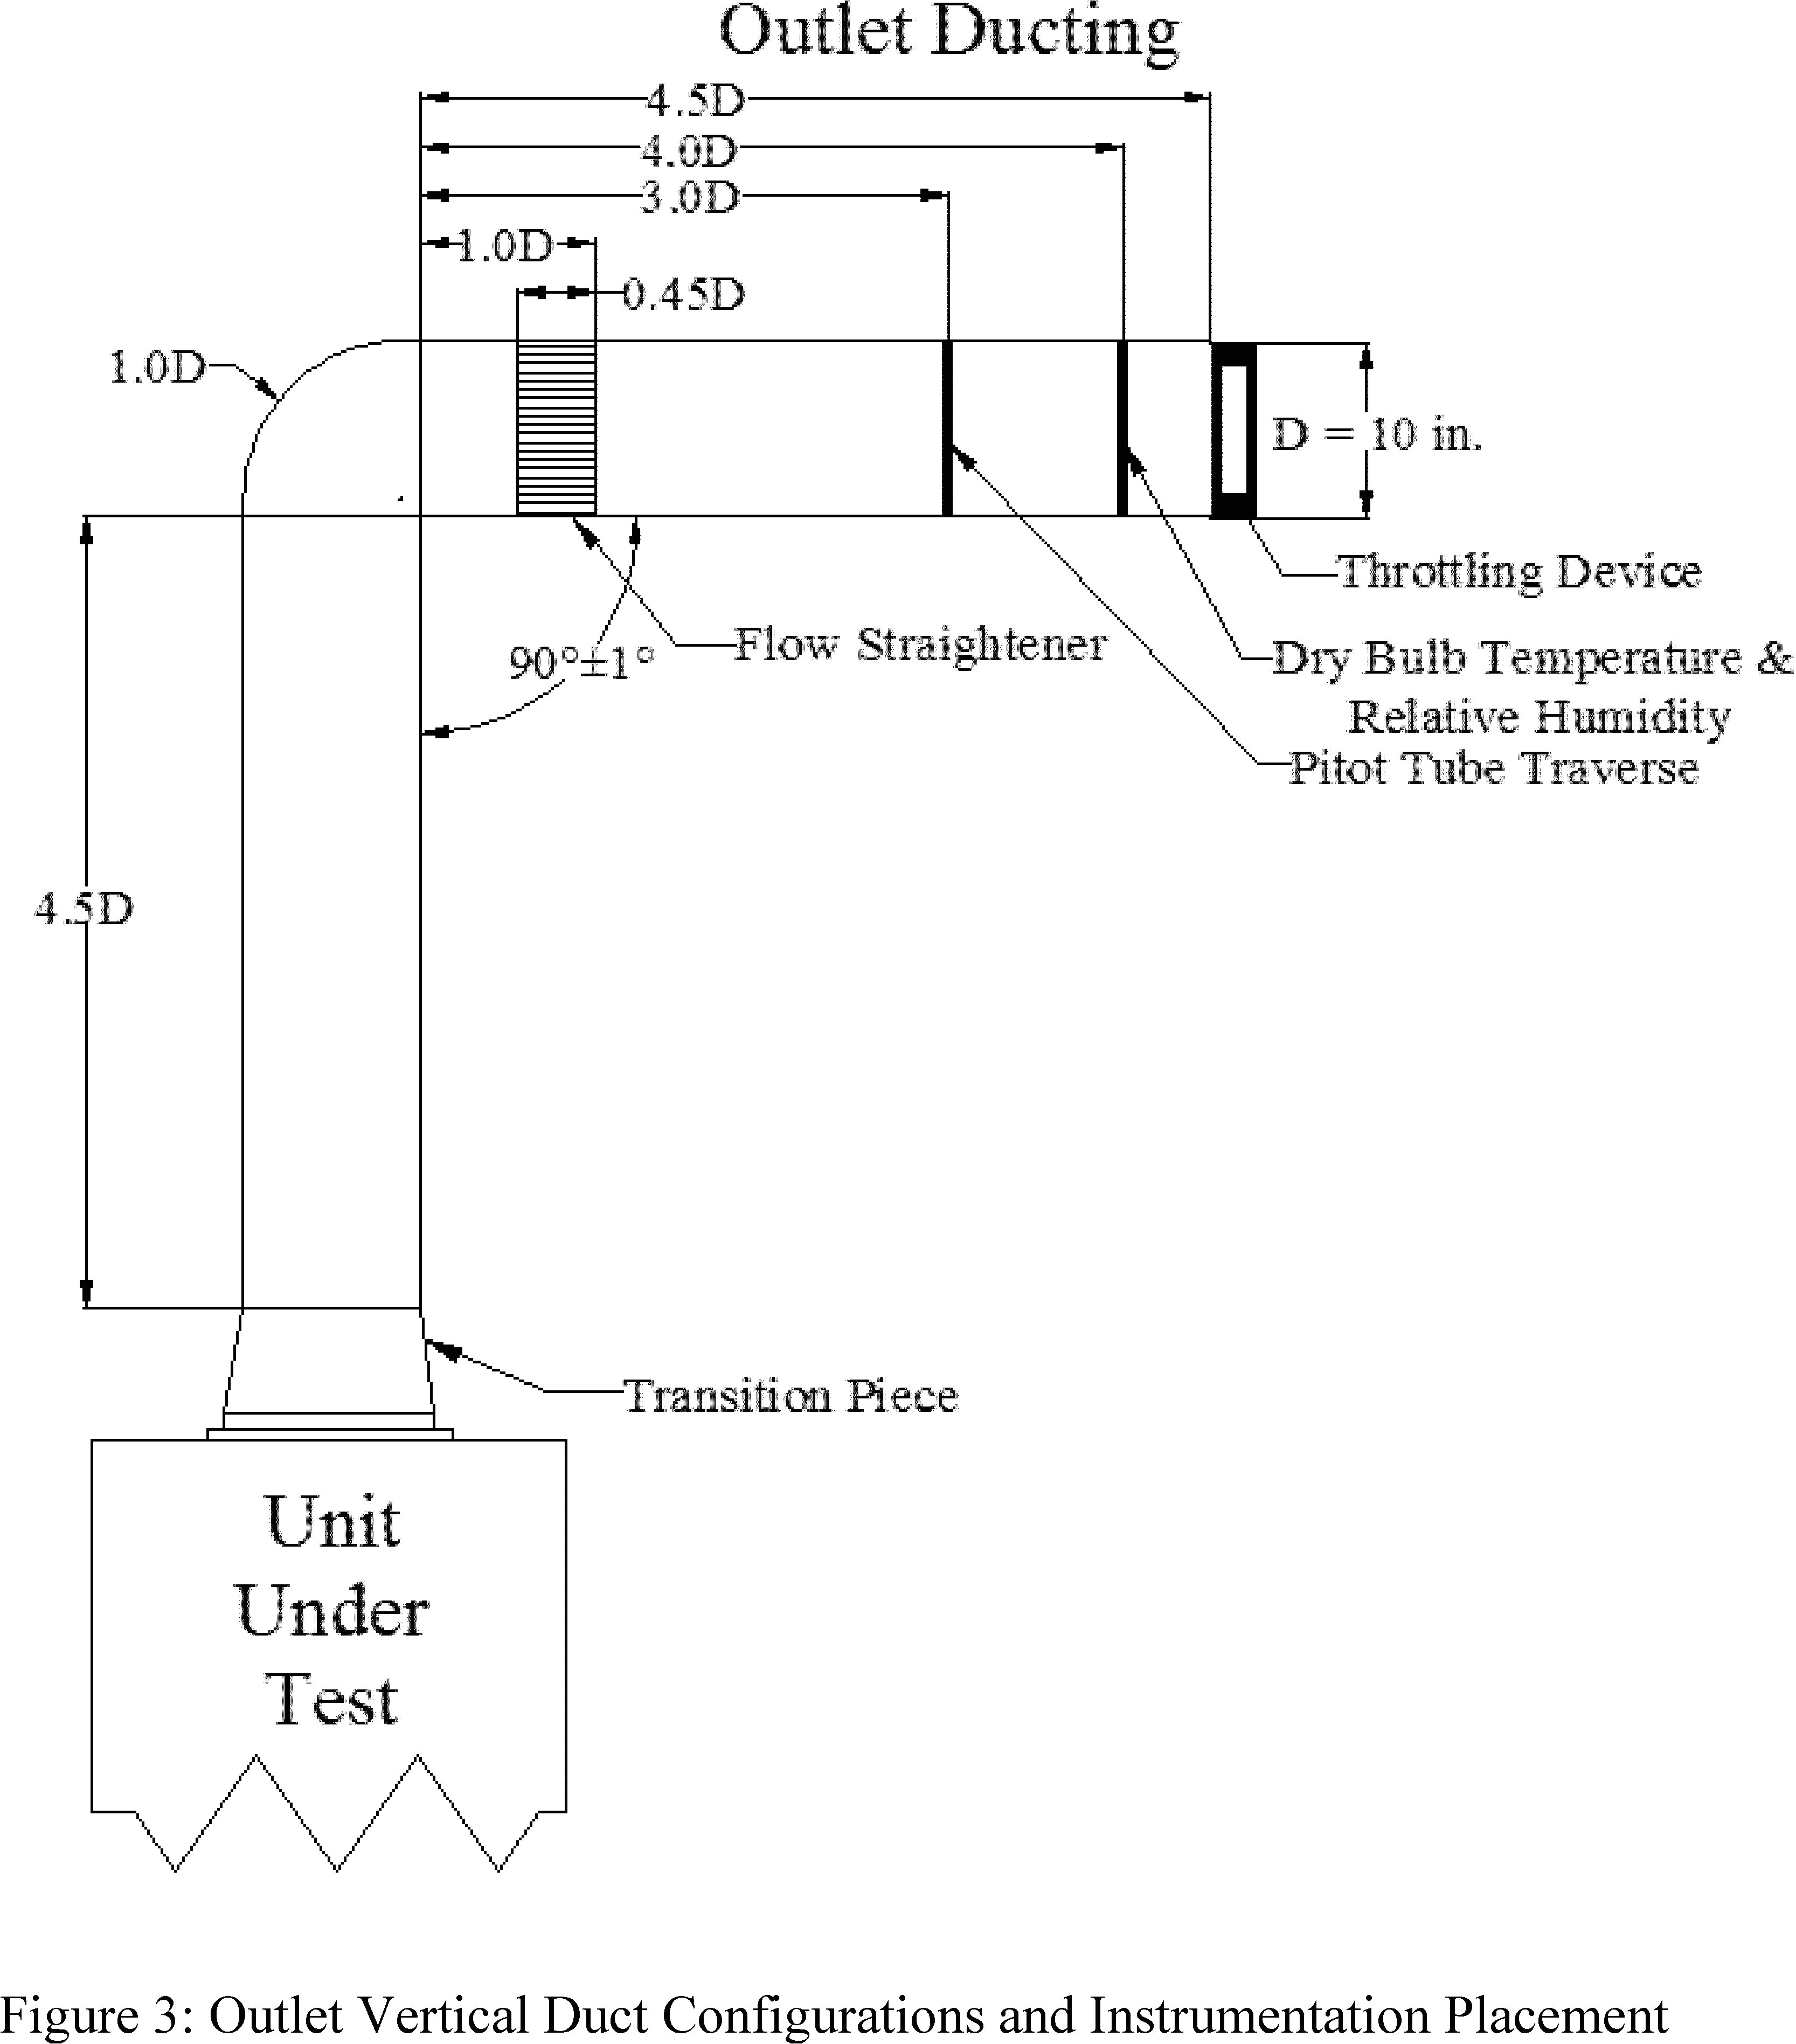 gas furnace wiring diagram new basic gas furnace wiring diagram best wiring diagram for a gas